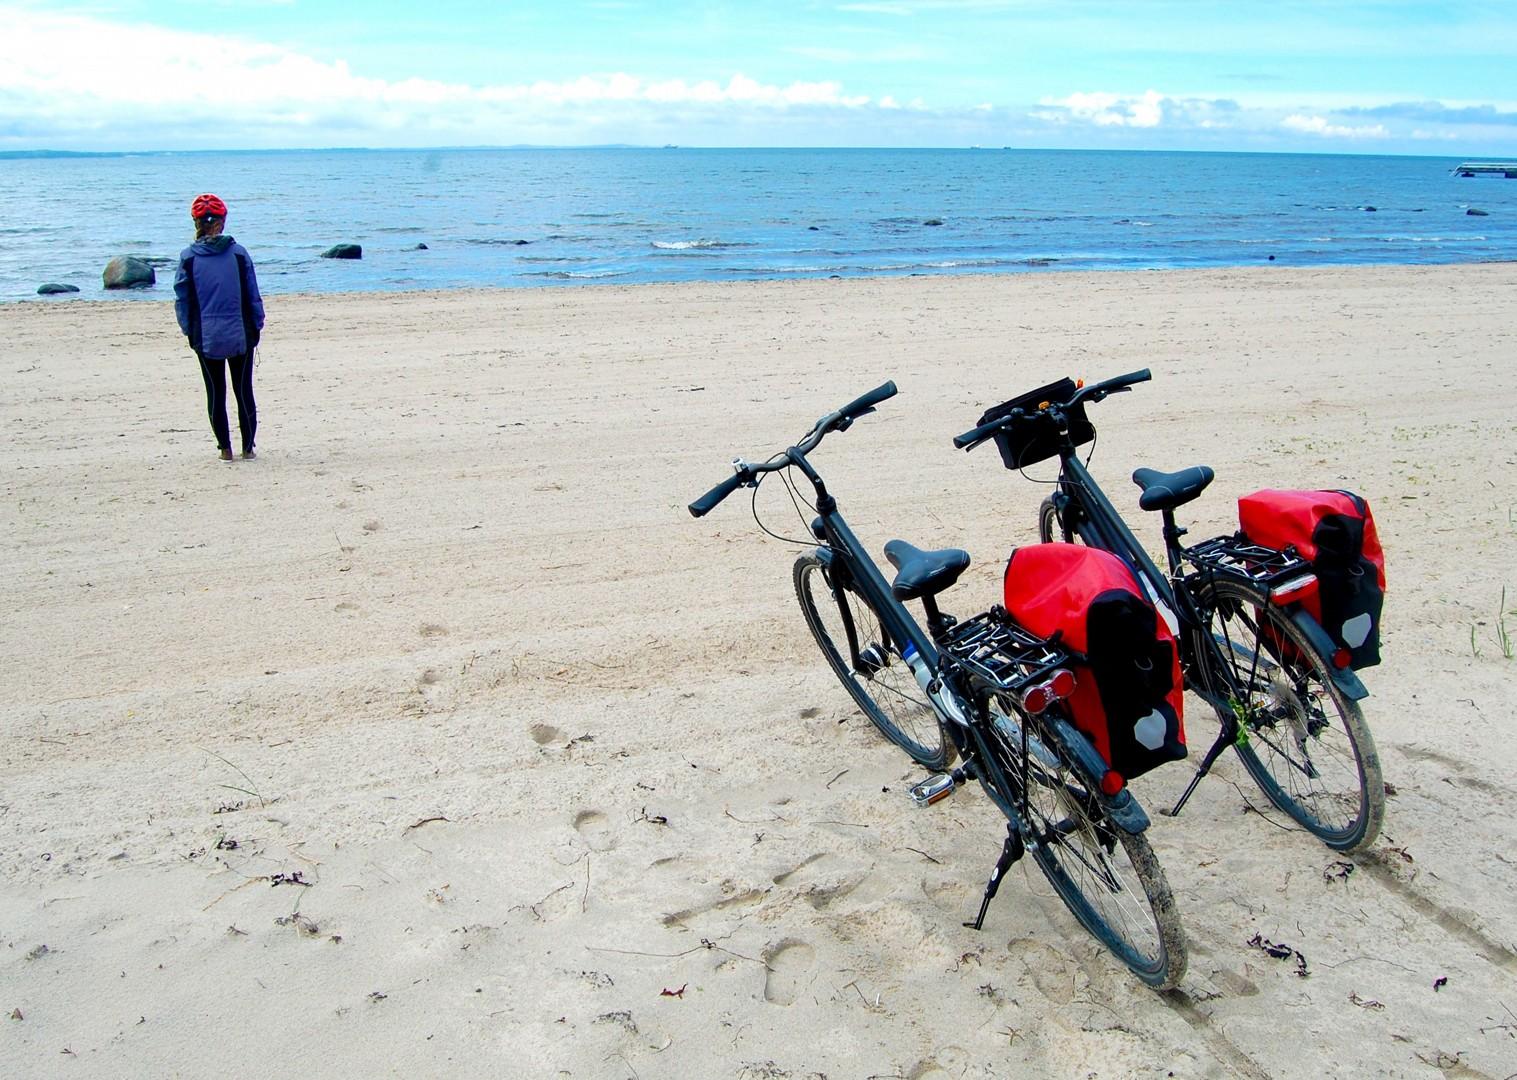 denmark-family-cycling-holiday-coast-beach-views.jpg - Denmark - Coast, Castles and Copenhagen - Self-Guided Leisure Cycling Holiday - Leisure Cycling